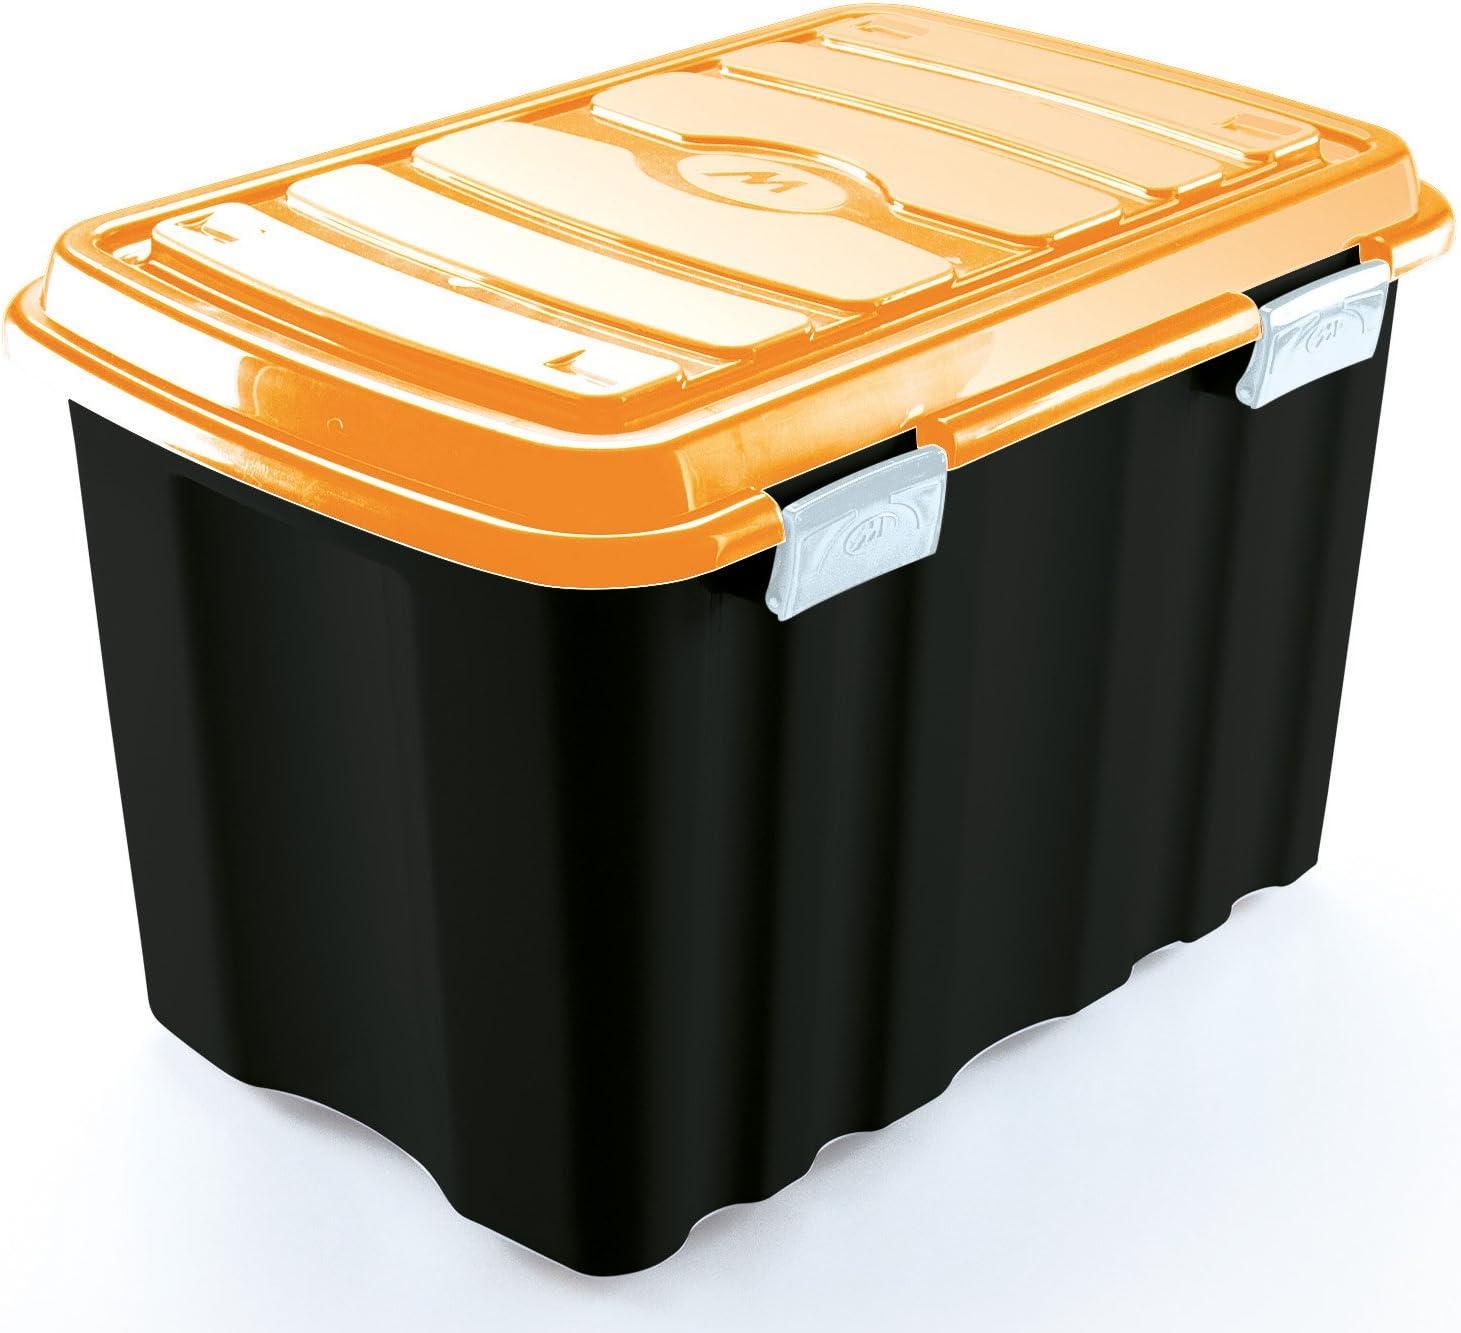 M-Home Box with Lid, Black and Orange, 54L    60 cm x 39,5 cm x 38 cm